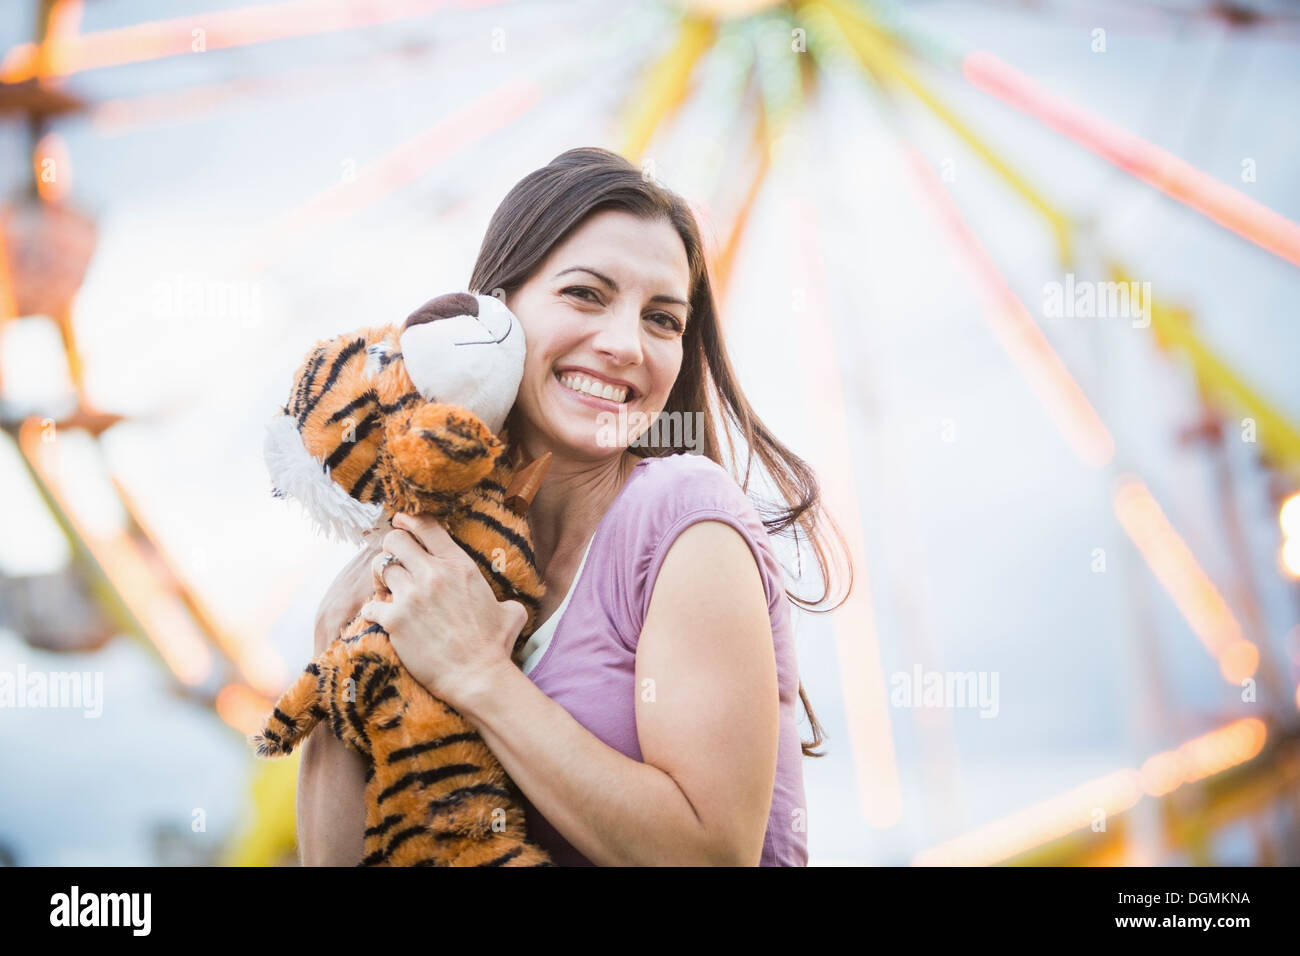 USA, Utah, Salt Lake City, Portrait of woman with toy tiger - Stock Image